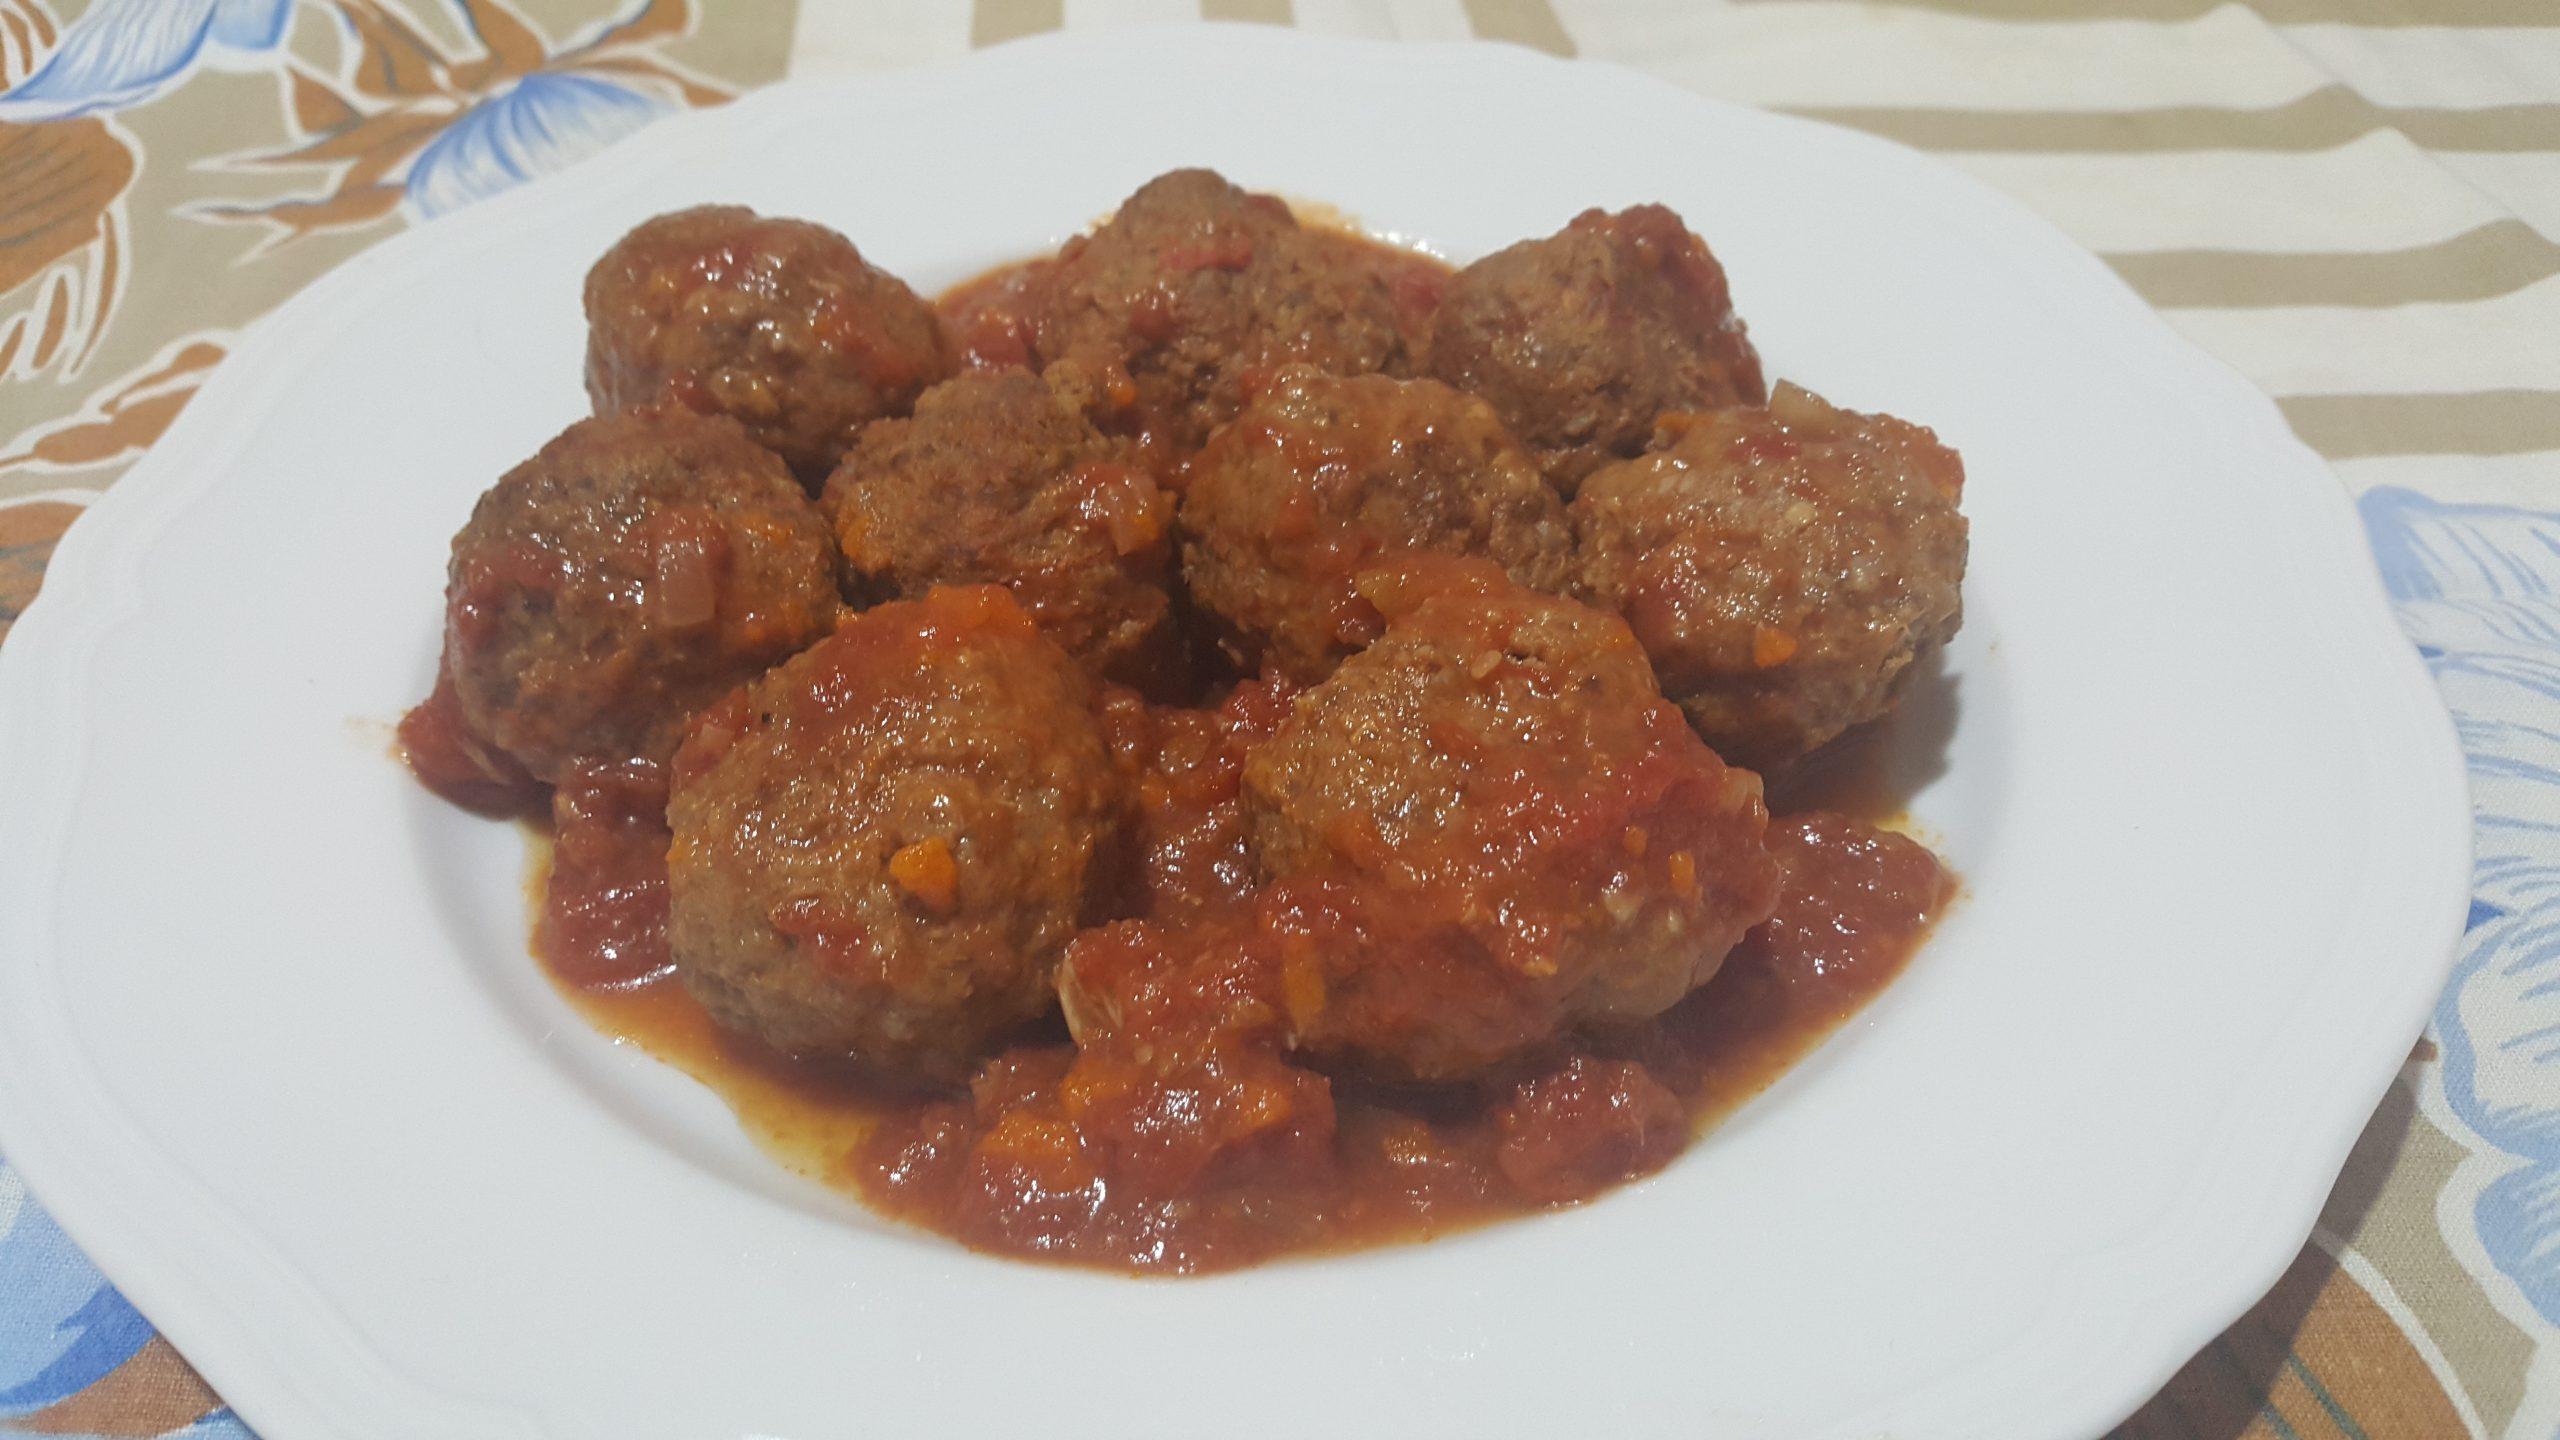 American meatballs